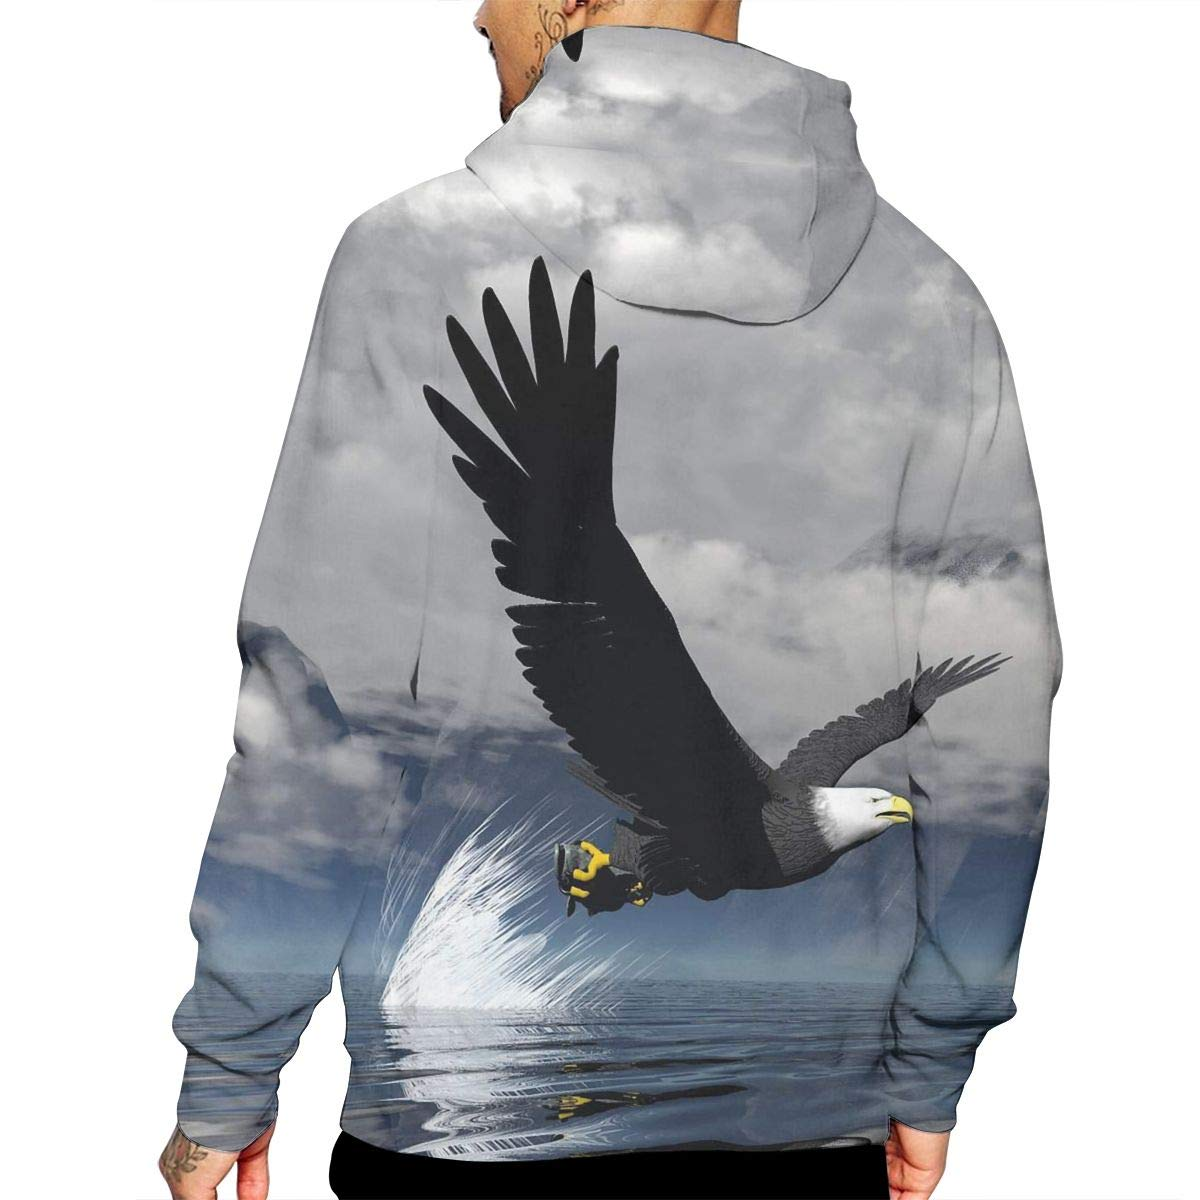 Sea Eagle Mans Long Sleeve Hoodie Casual Pocket Hooded Sweatshirt